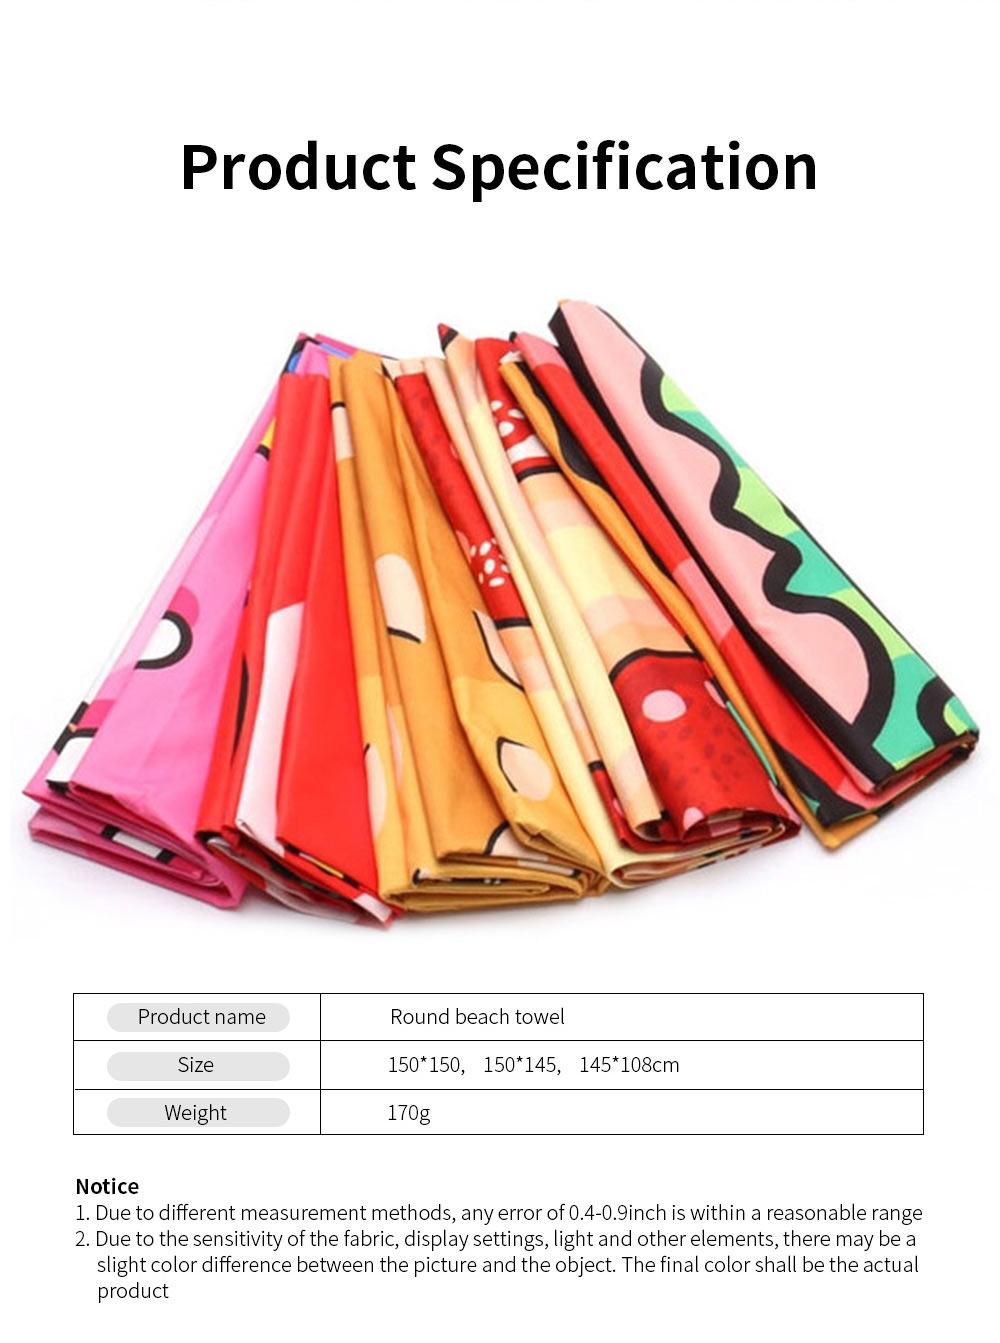 Round Beach Towel Microfiber Fabric Creative Pizza Shape Yoga Mat Tassels Circle Beach Blanket with 60 inch Diameter 6